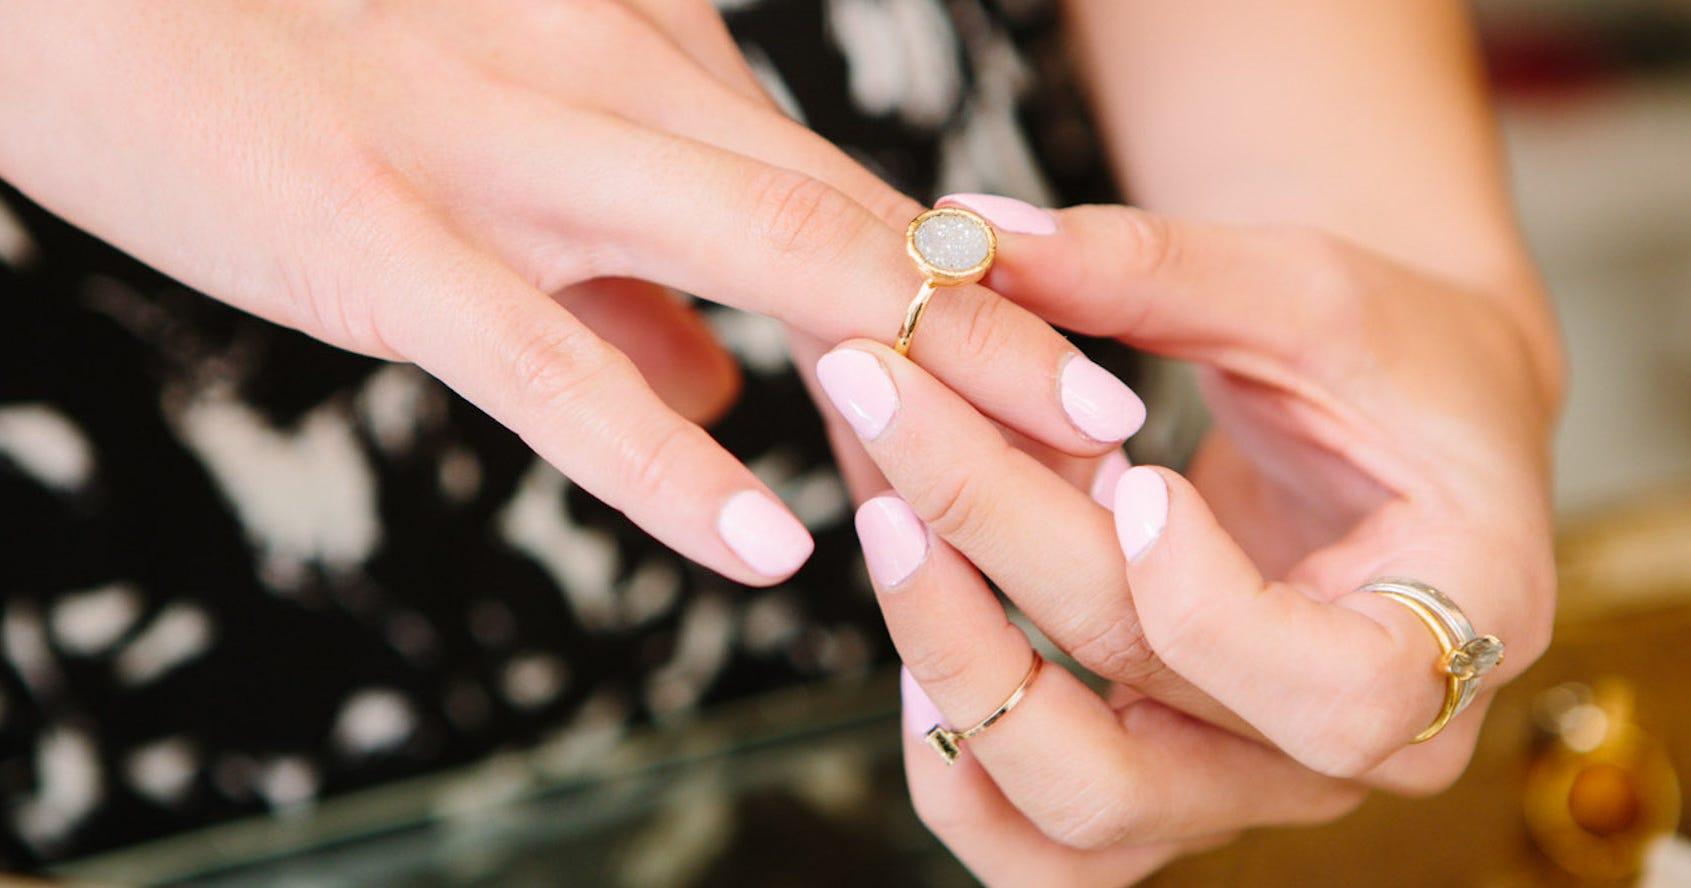 sotheby pinkfarbener diamant ist der teuerste der welt. Black Bedroom Furniture Sets. Home Design Ideas